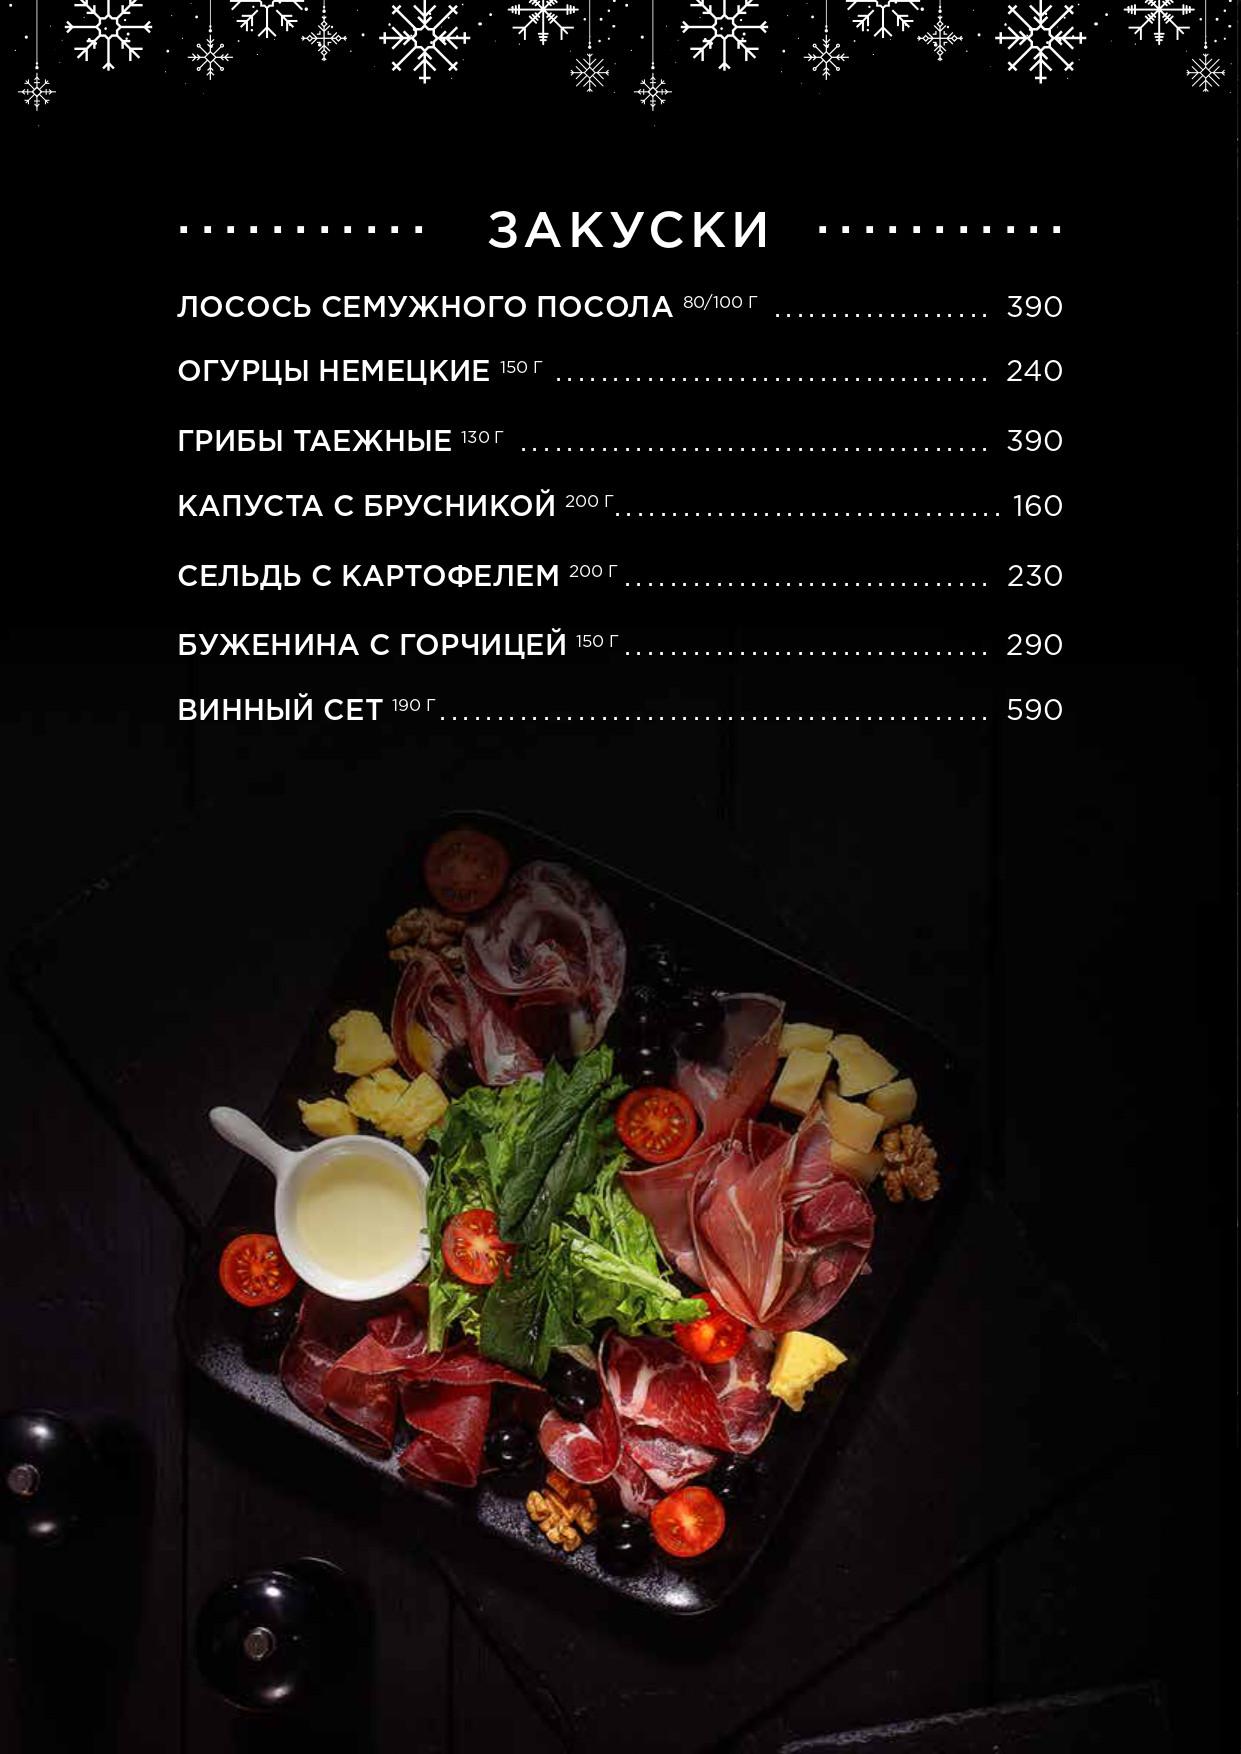 gastroli_menu_ny_2021_1превью_page-0002.